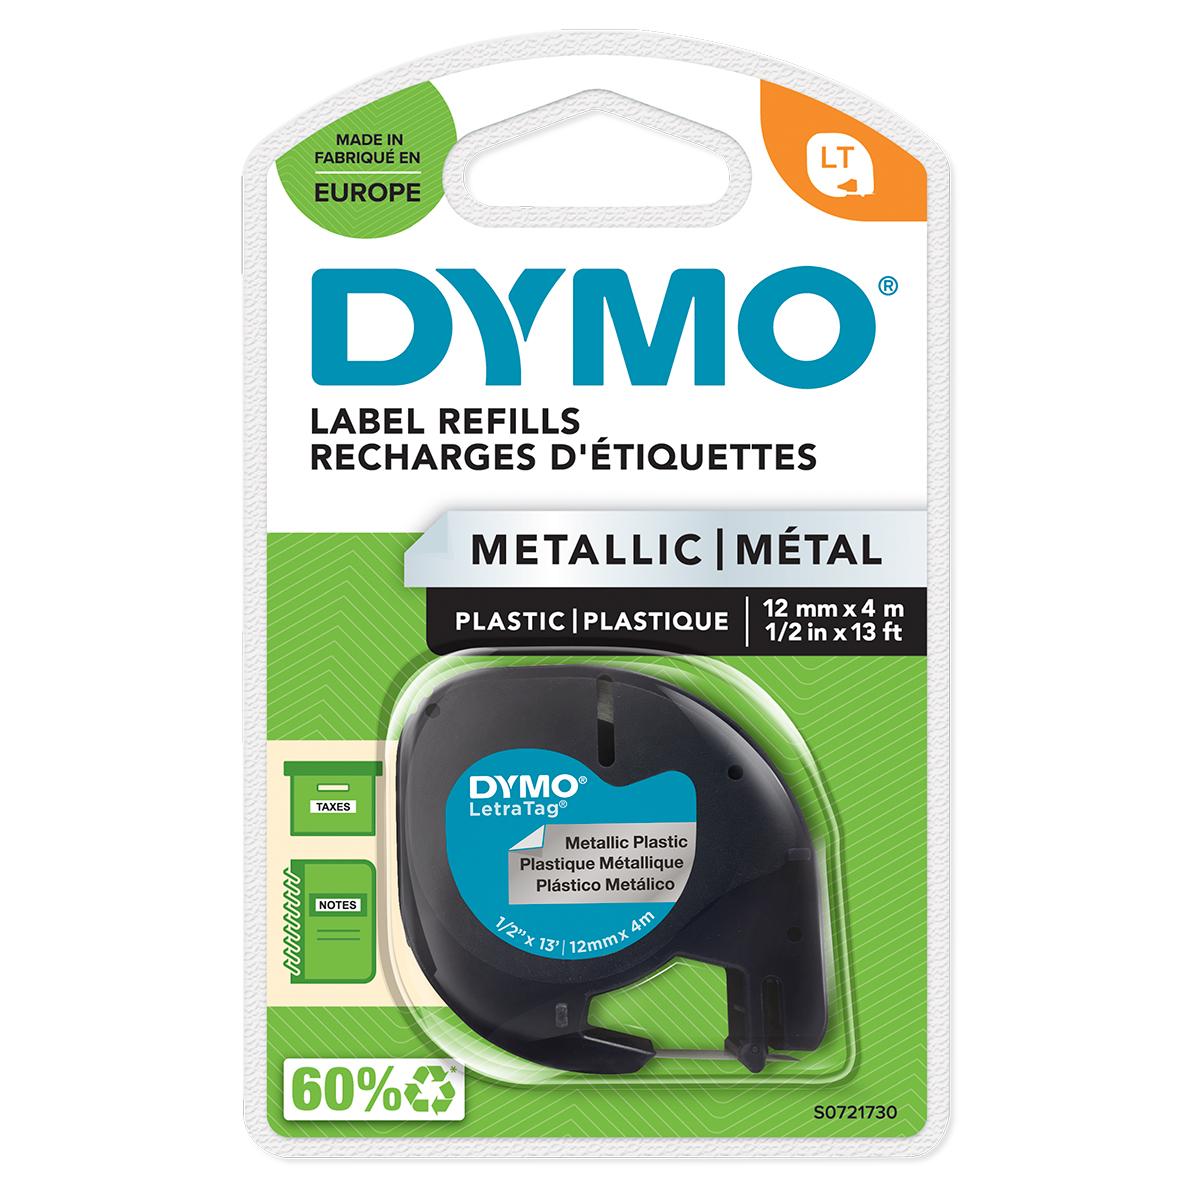 Dymo 91208 12mm x 4m Black On Metallic Silver Tape